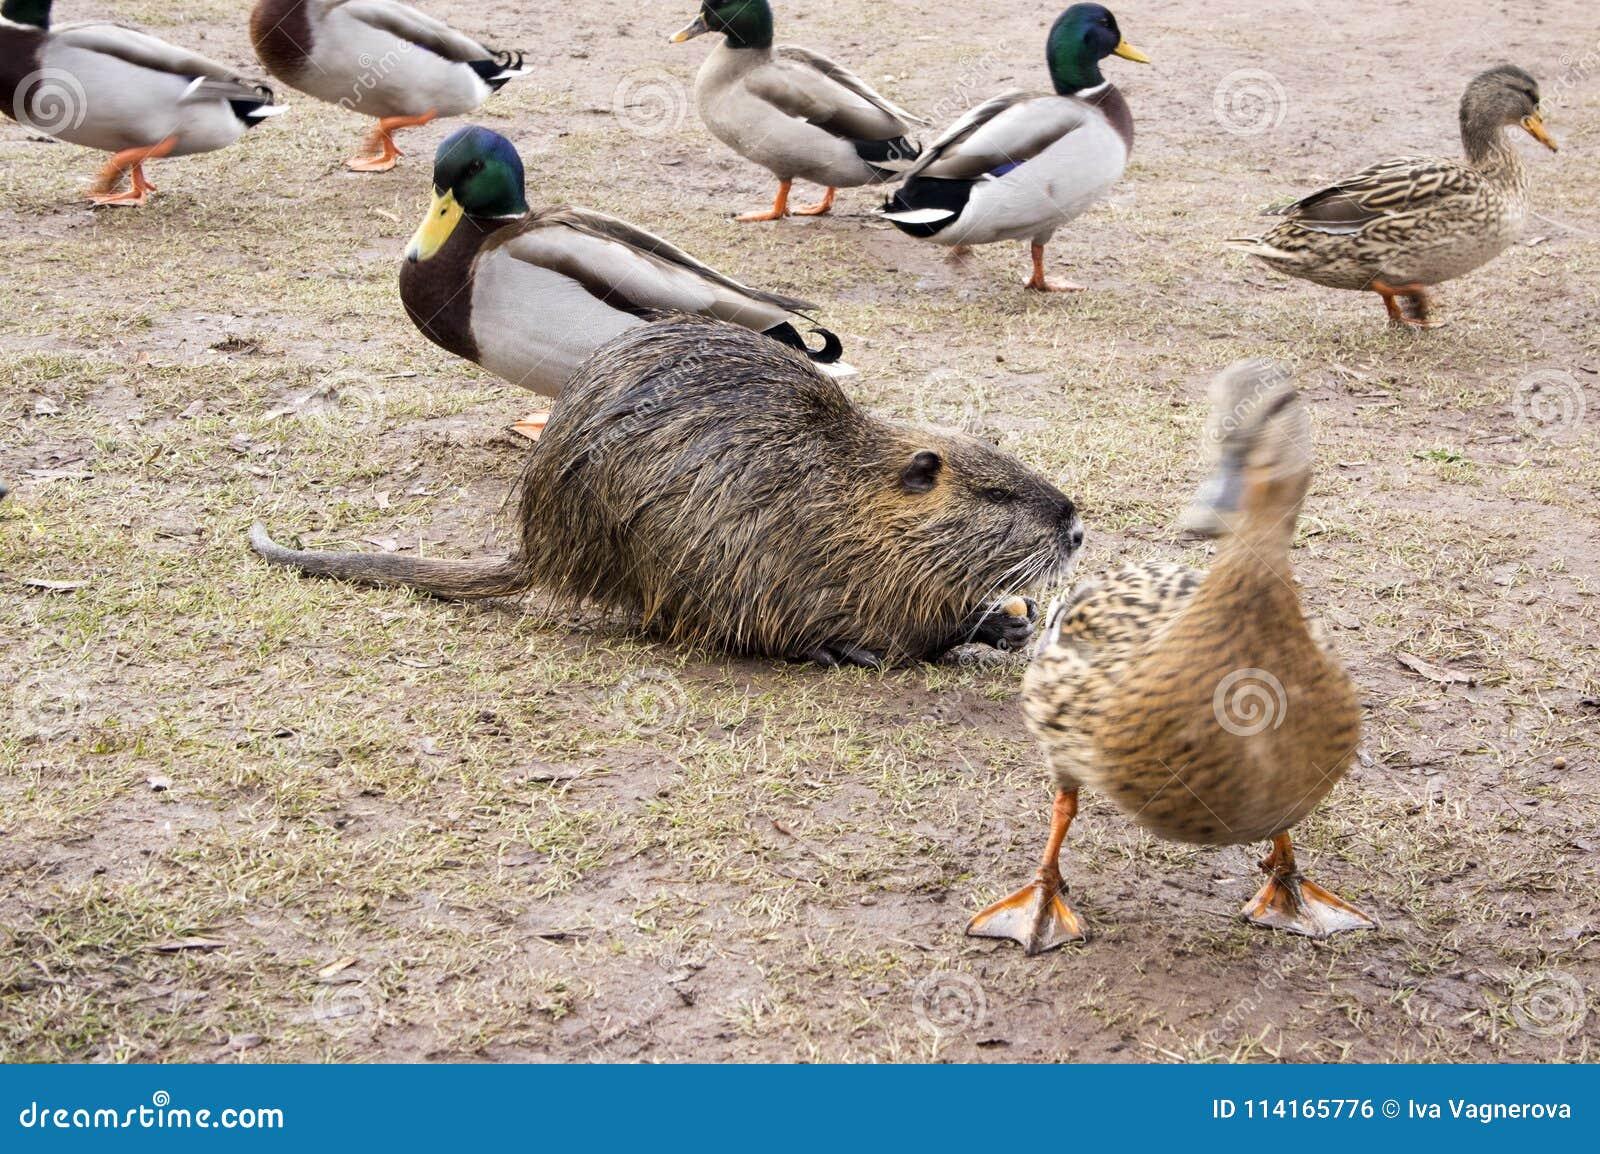 Coypu, Flussratte, nutria Pelztier und Gruppe Enten